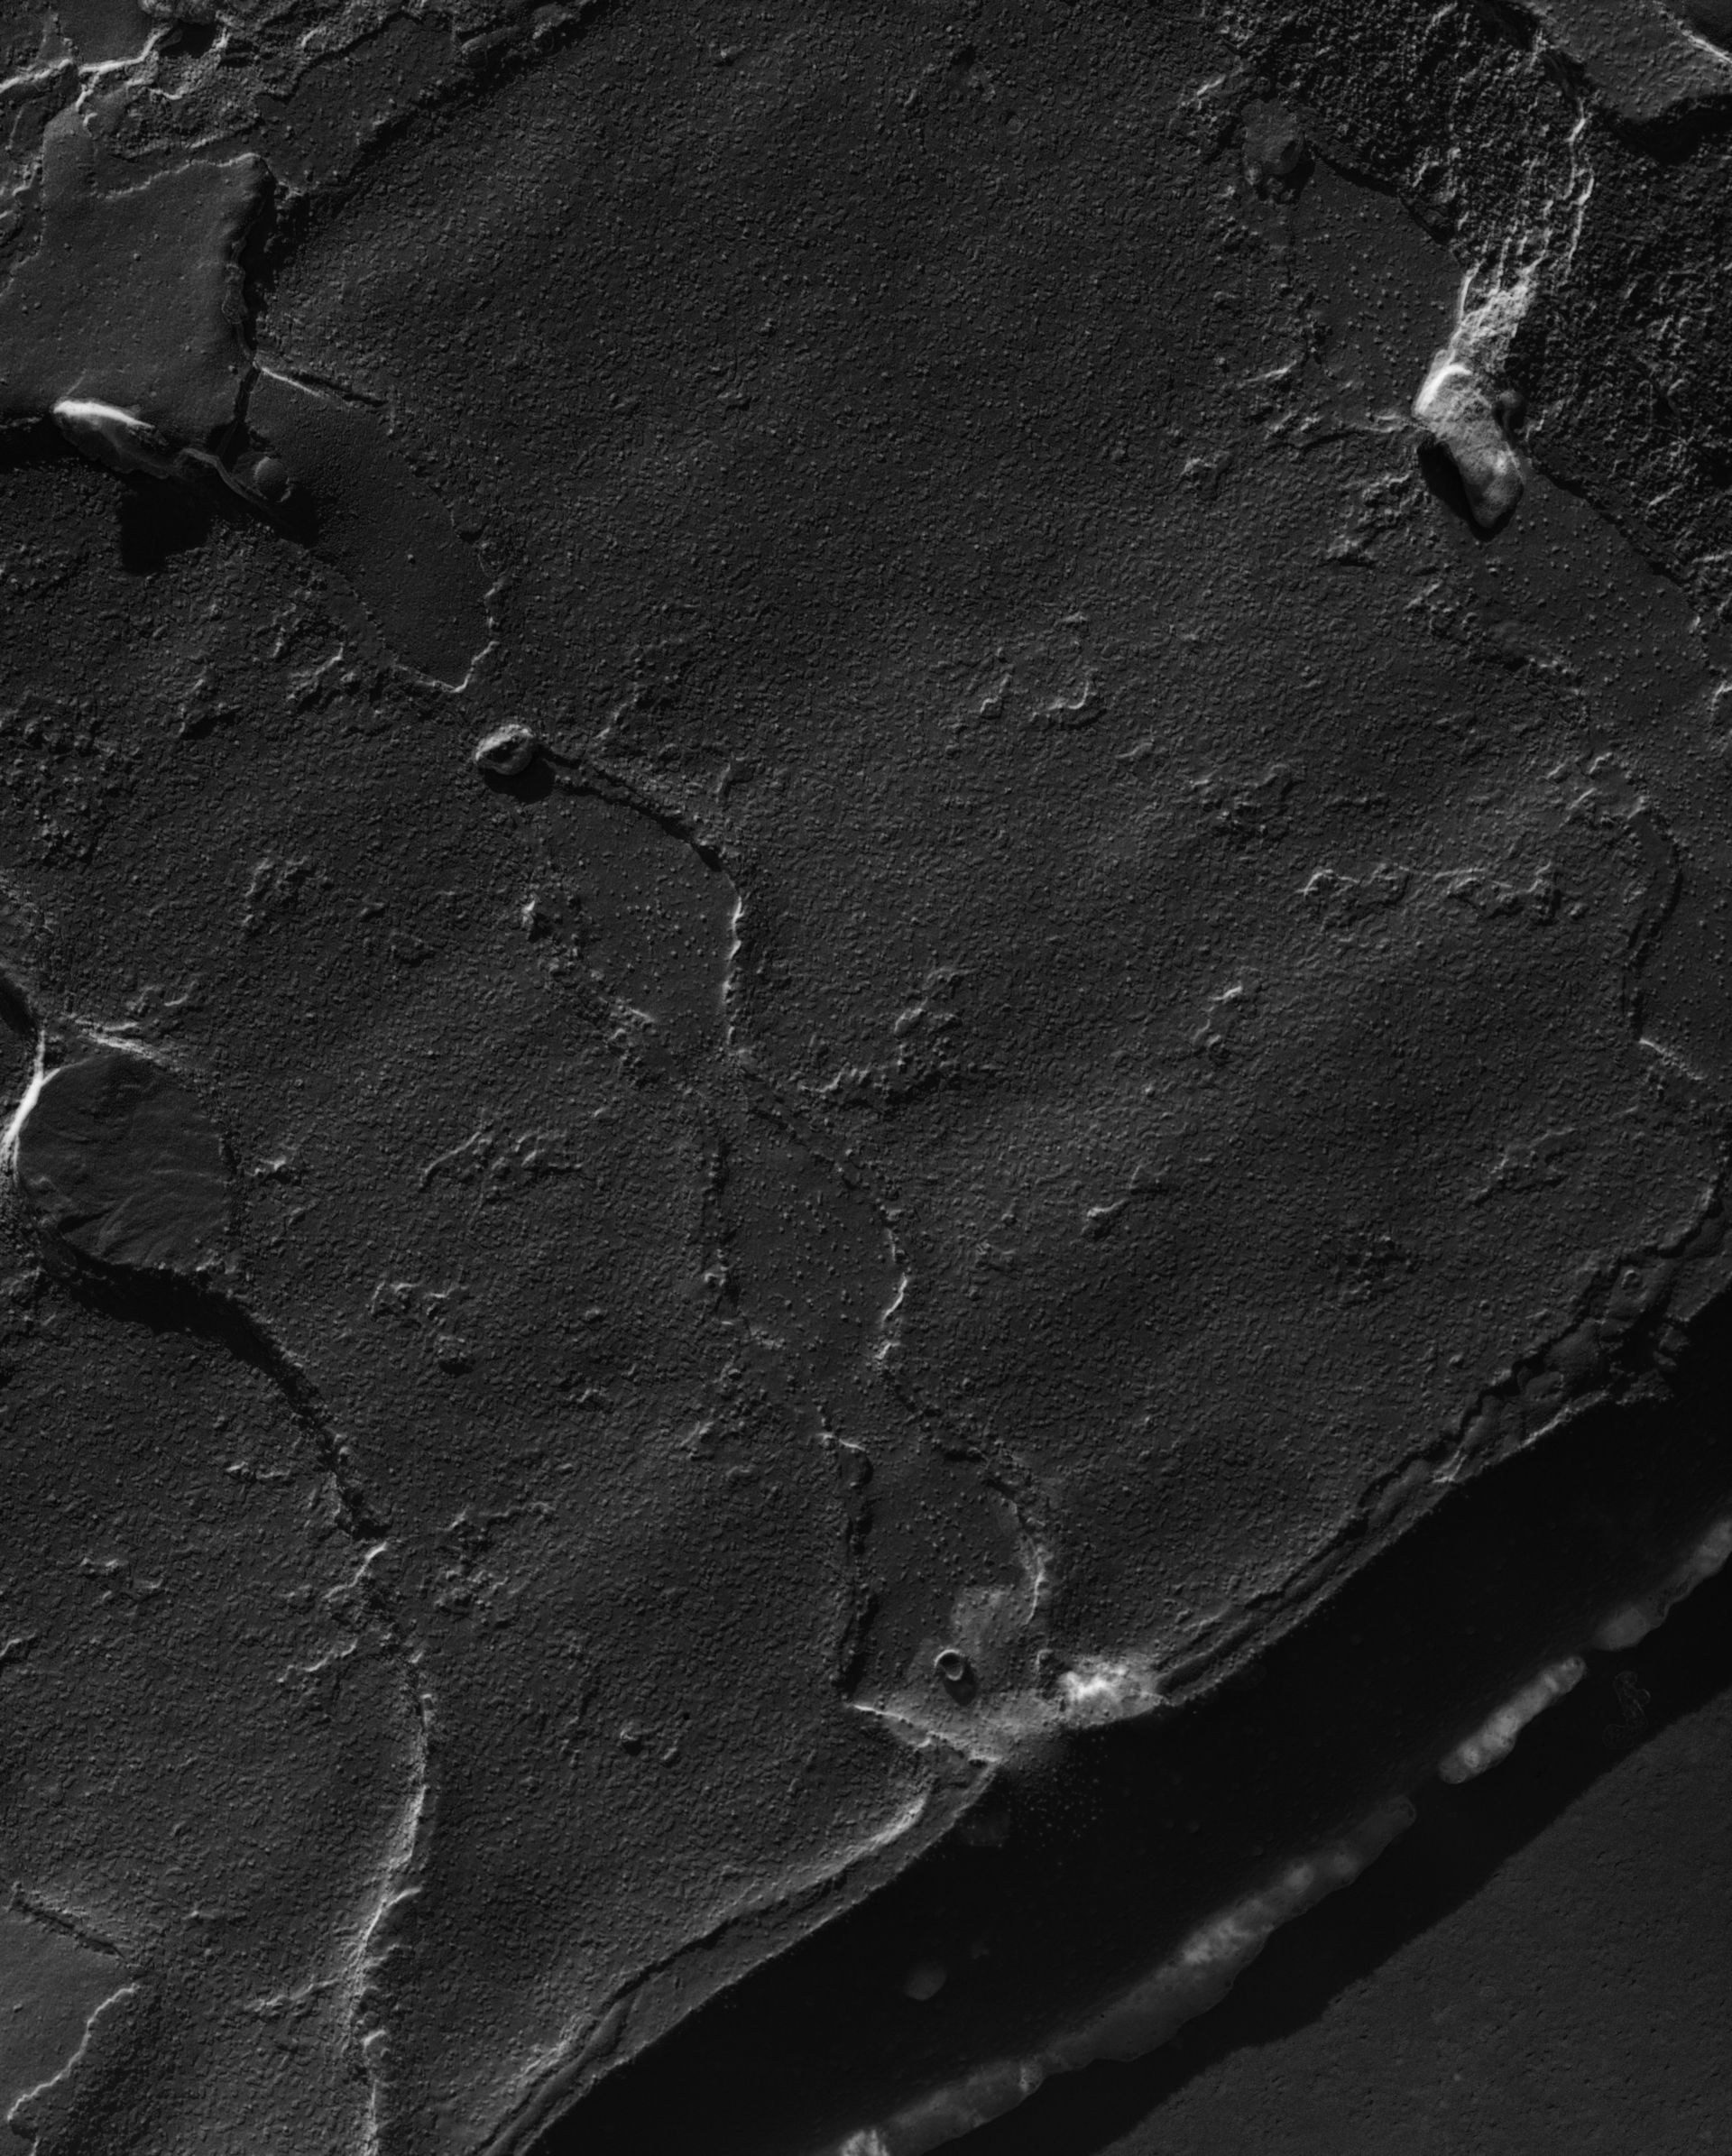 Damselfly (Sarcoplasmic reticulum) - CIL:18470